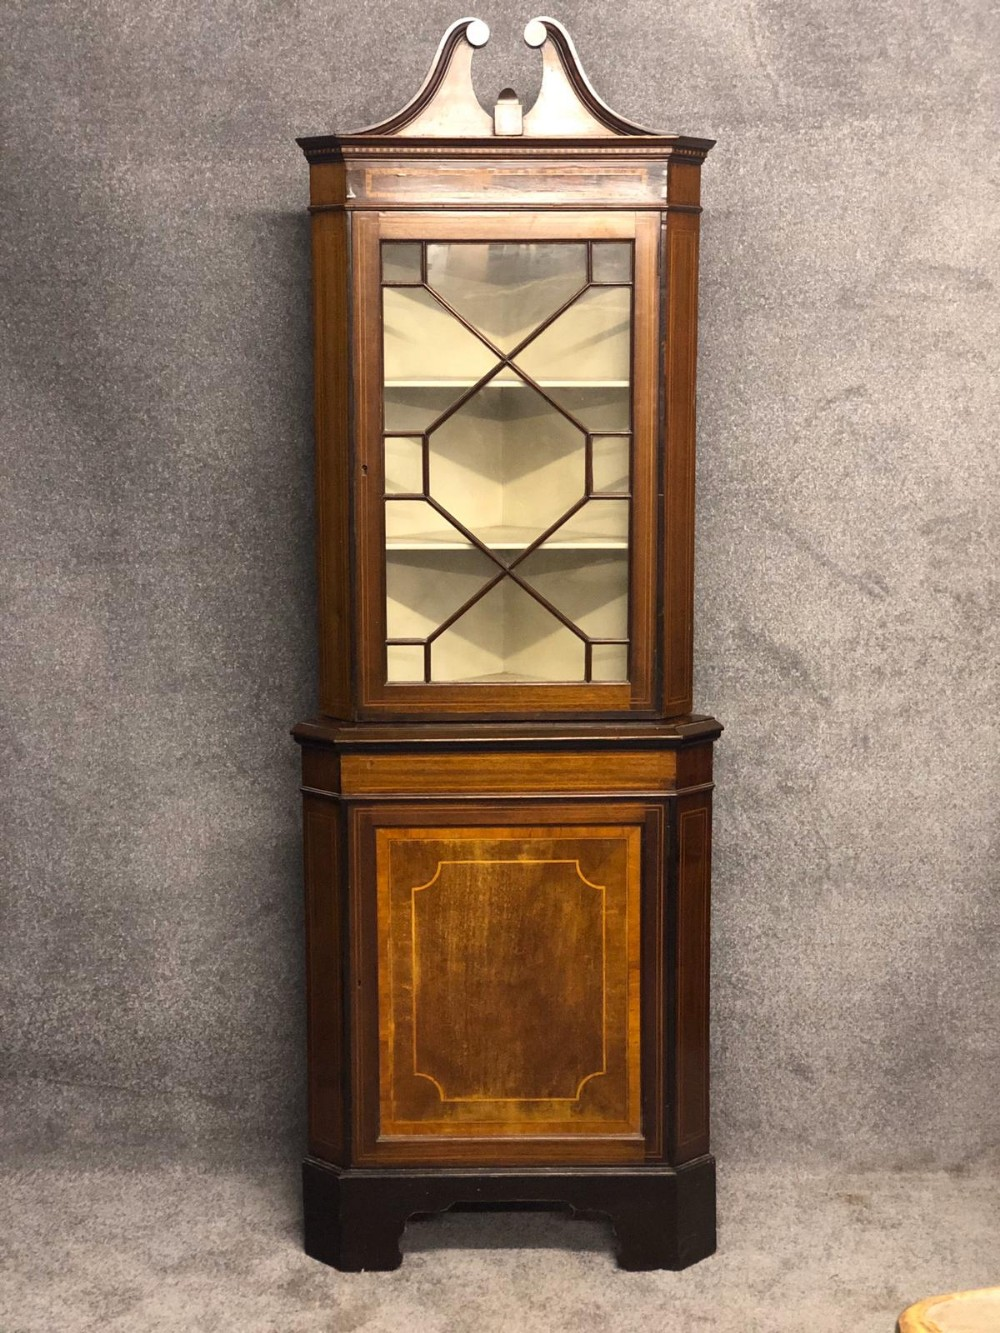 a original edwardian inlaid mahogany corner display cabinet in the sherrerton revival style